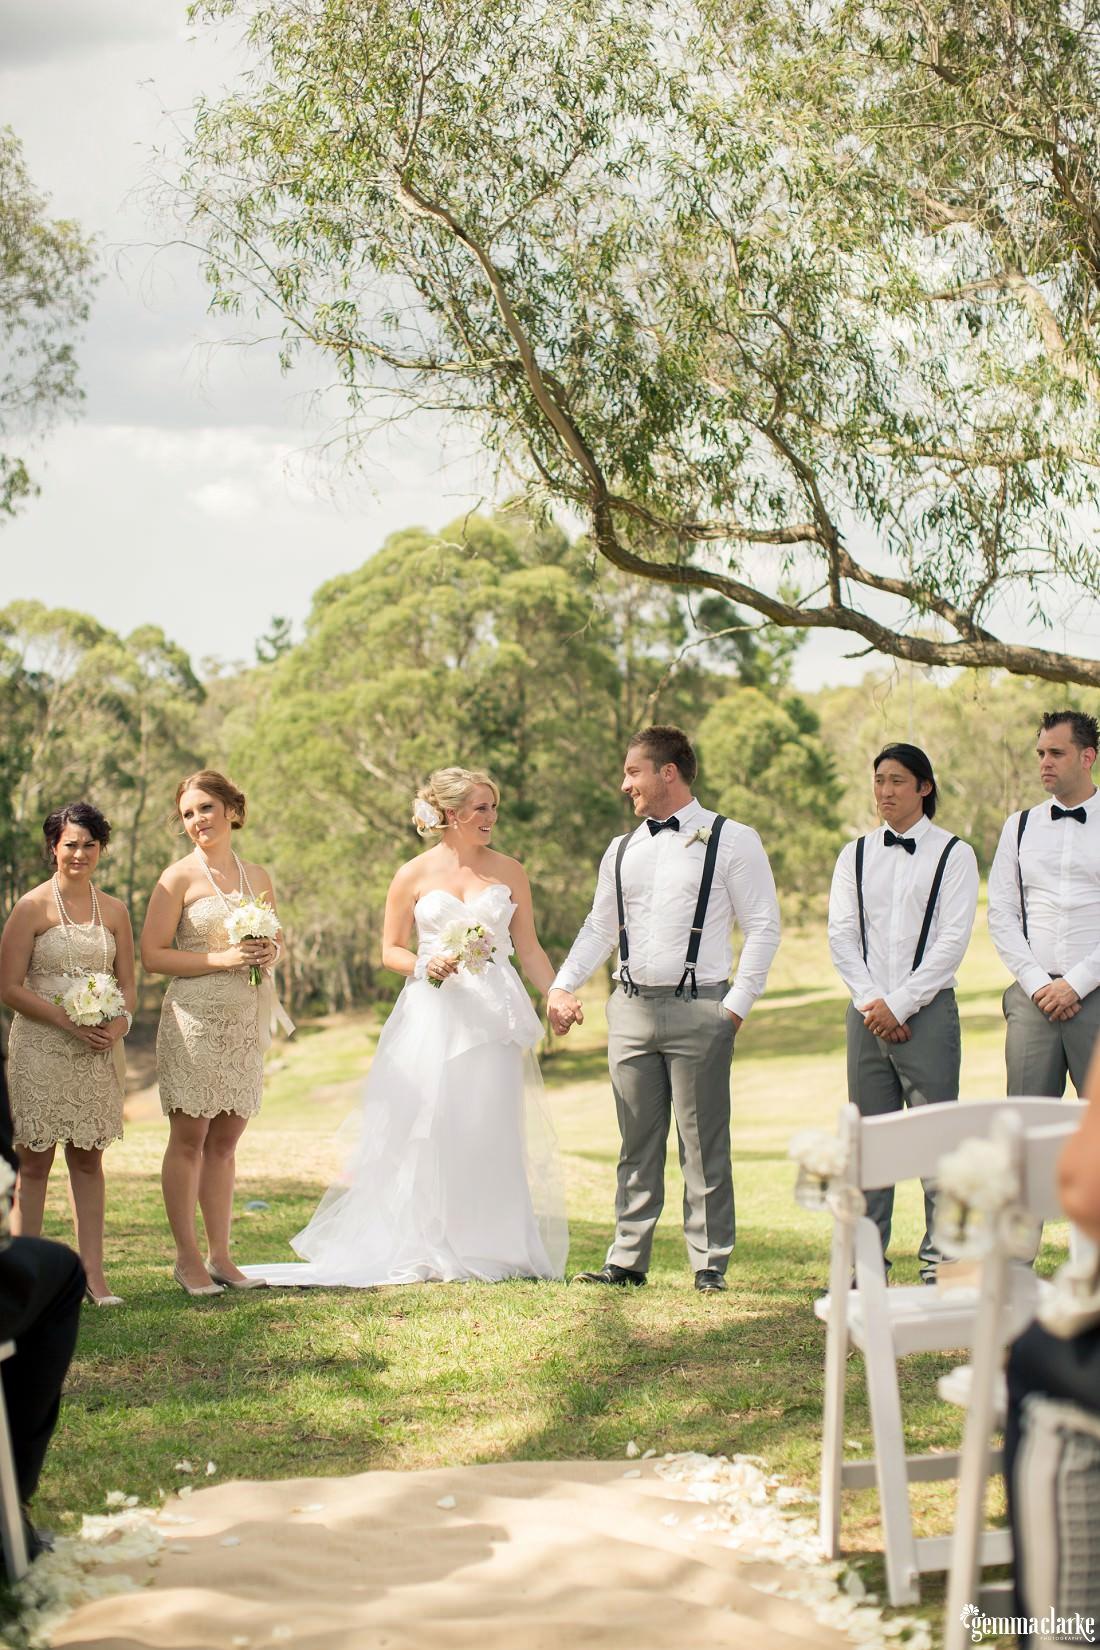 gemma-clarke-photography_southern-highlands-wedding_sylvan-glen-wedding_alicia-and-james_0016